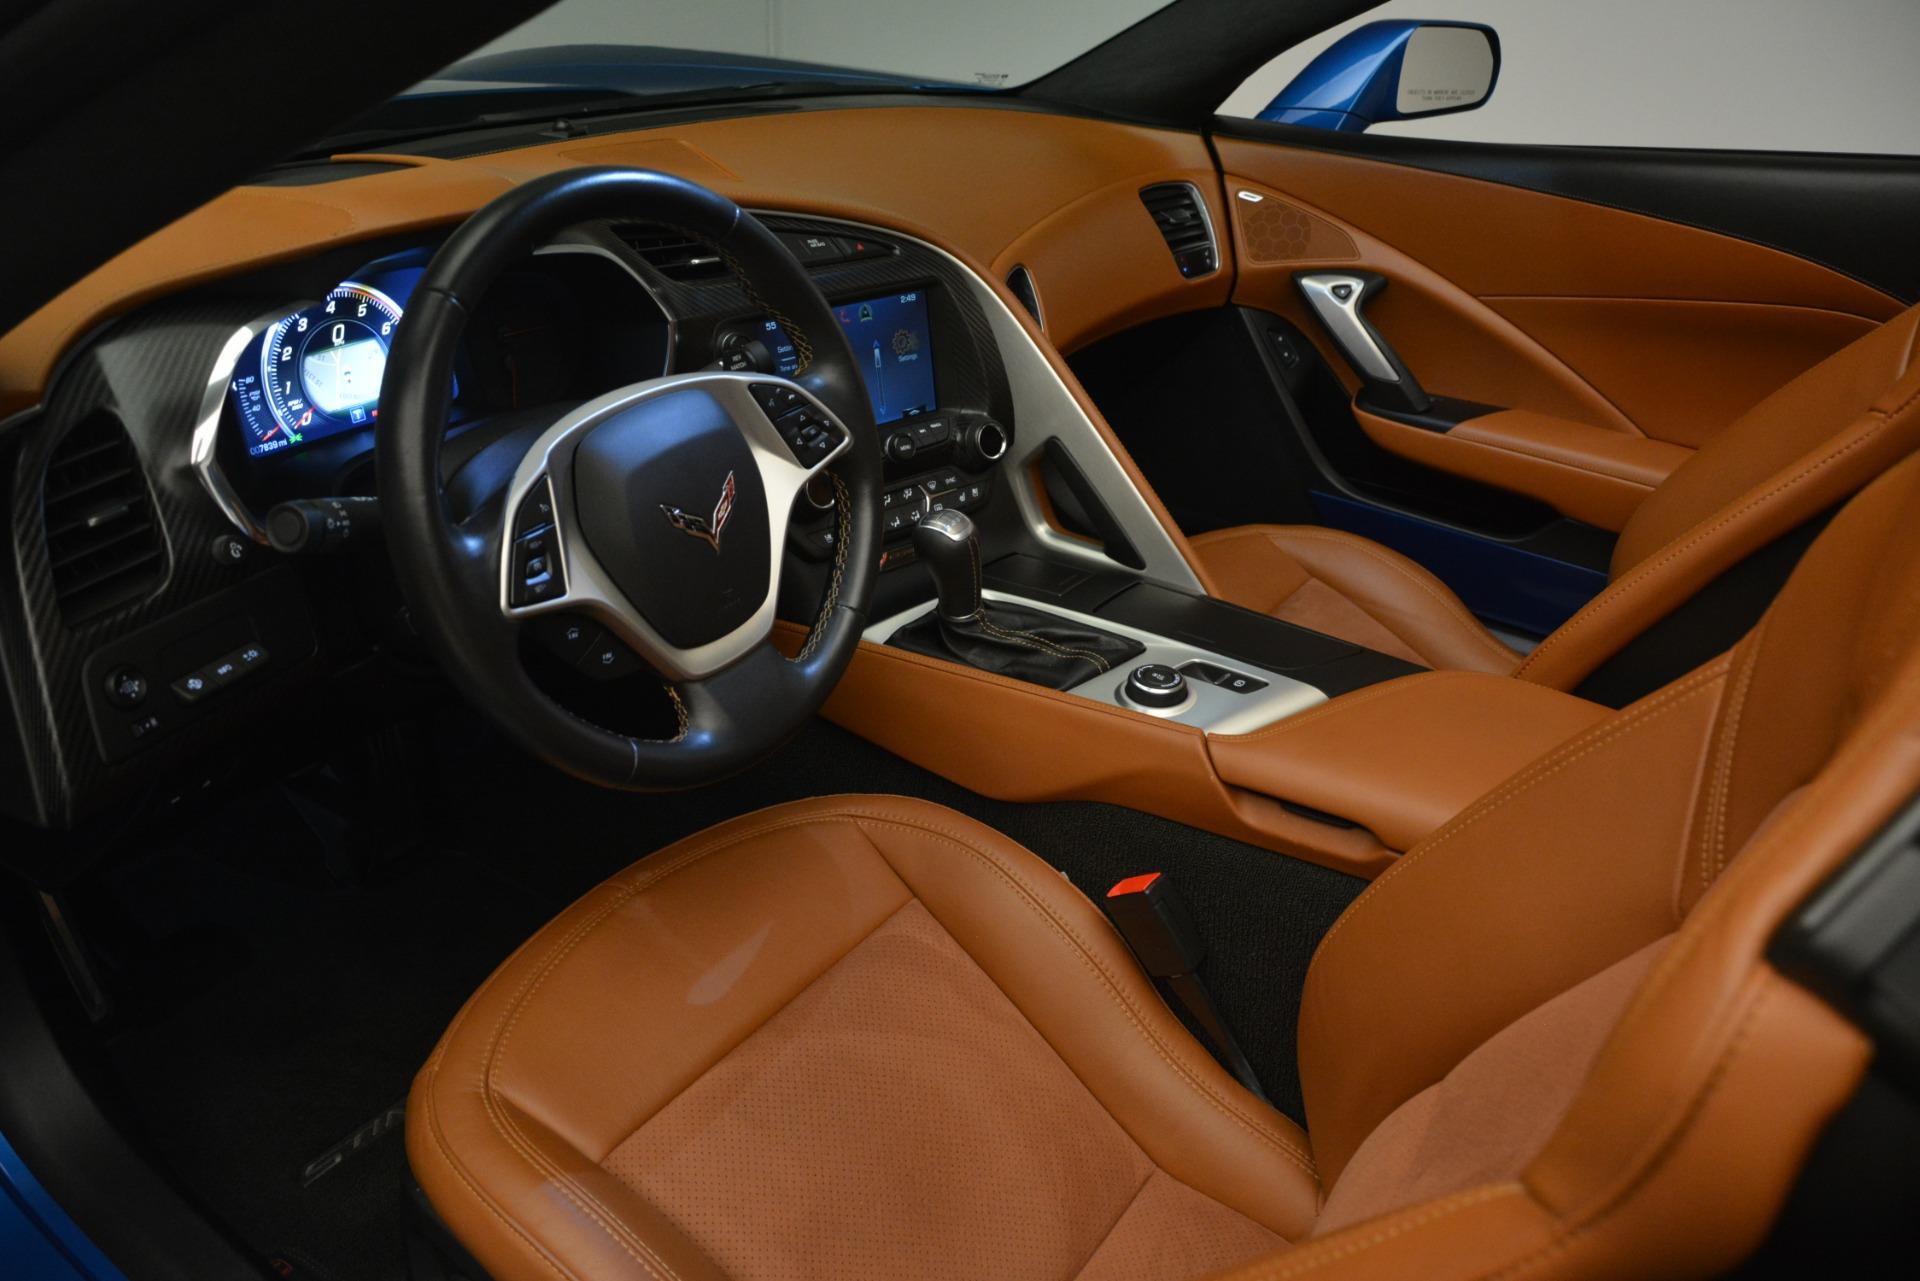 Used 2014 Chevrolet Corvette Stingray Z51 For Sale In Greenwich, CT 2703_p18